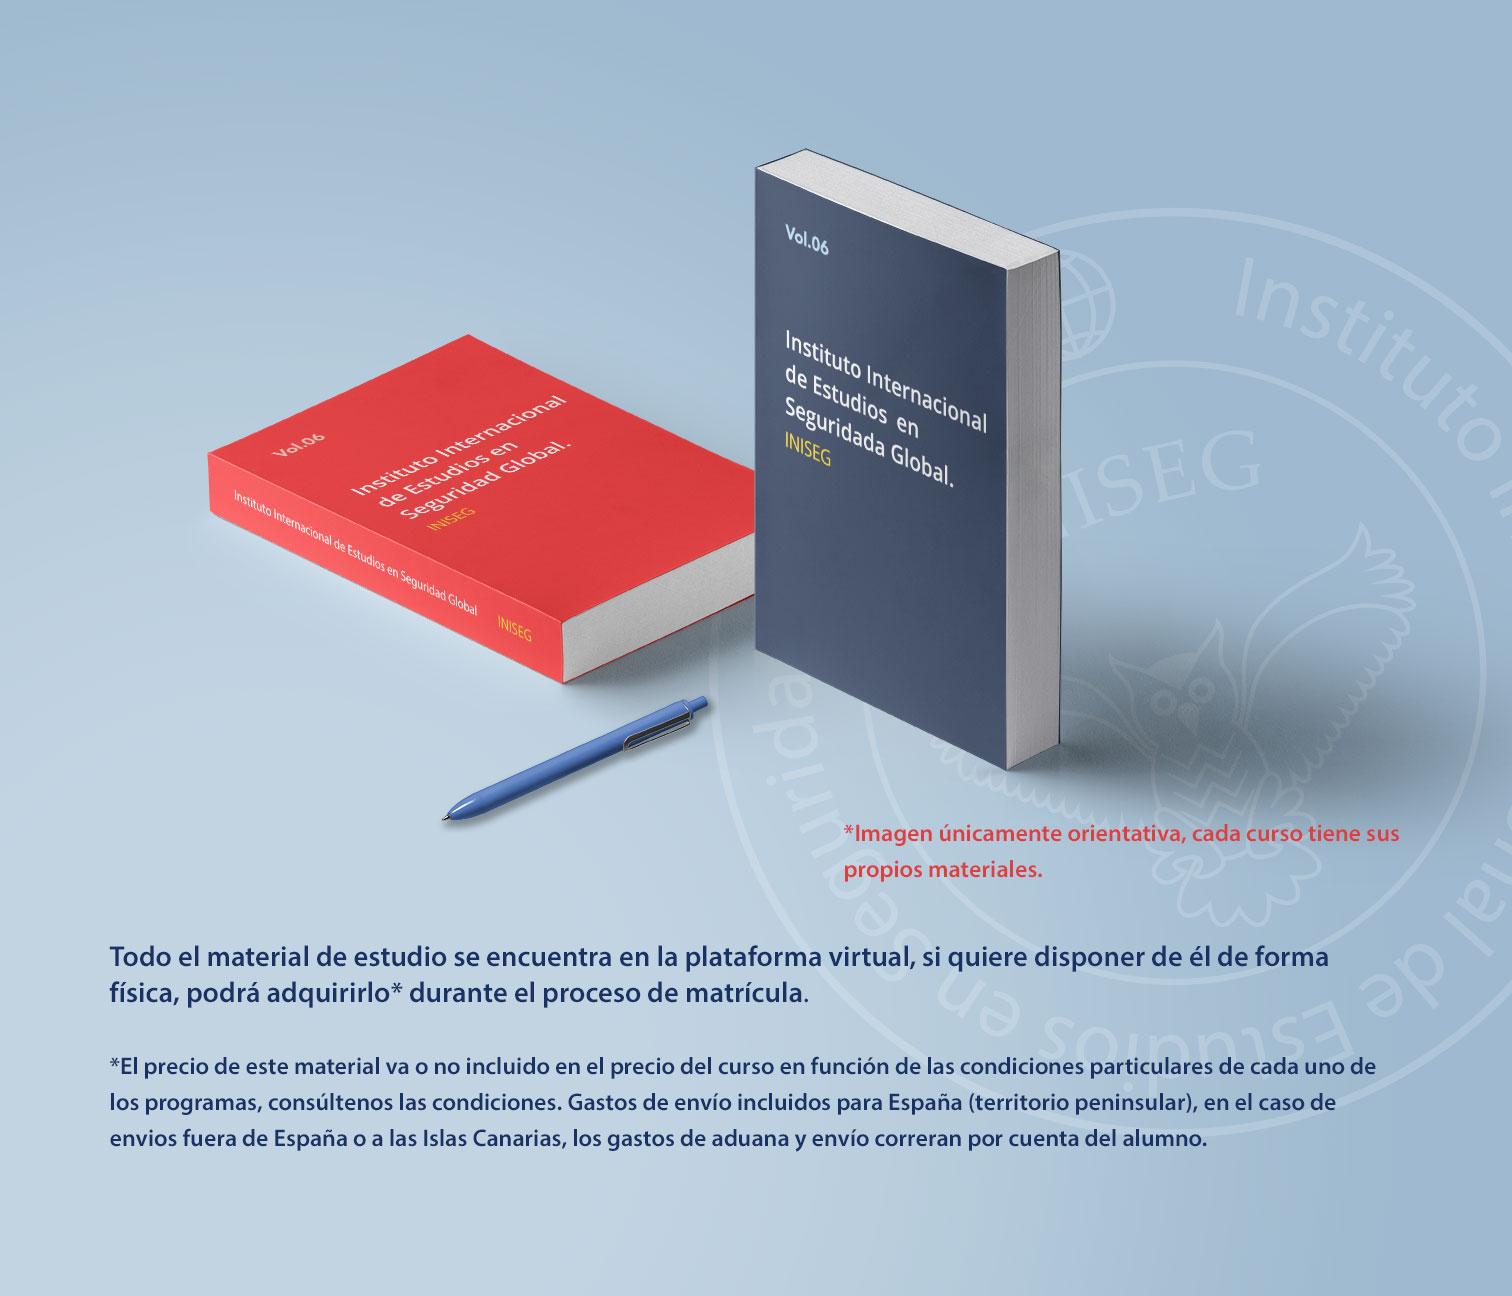 Materiales programa formativo Iniseg